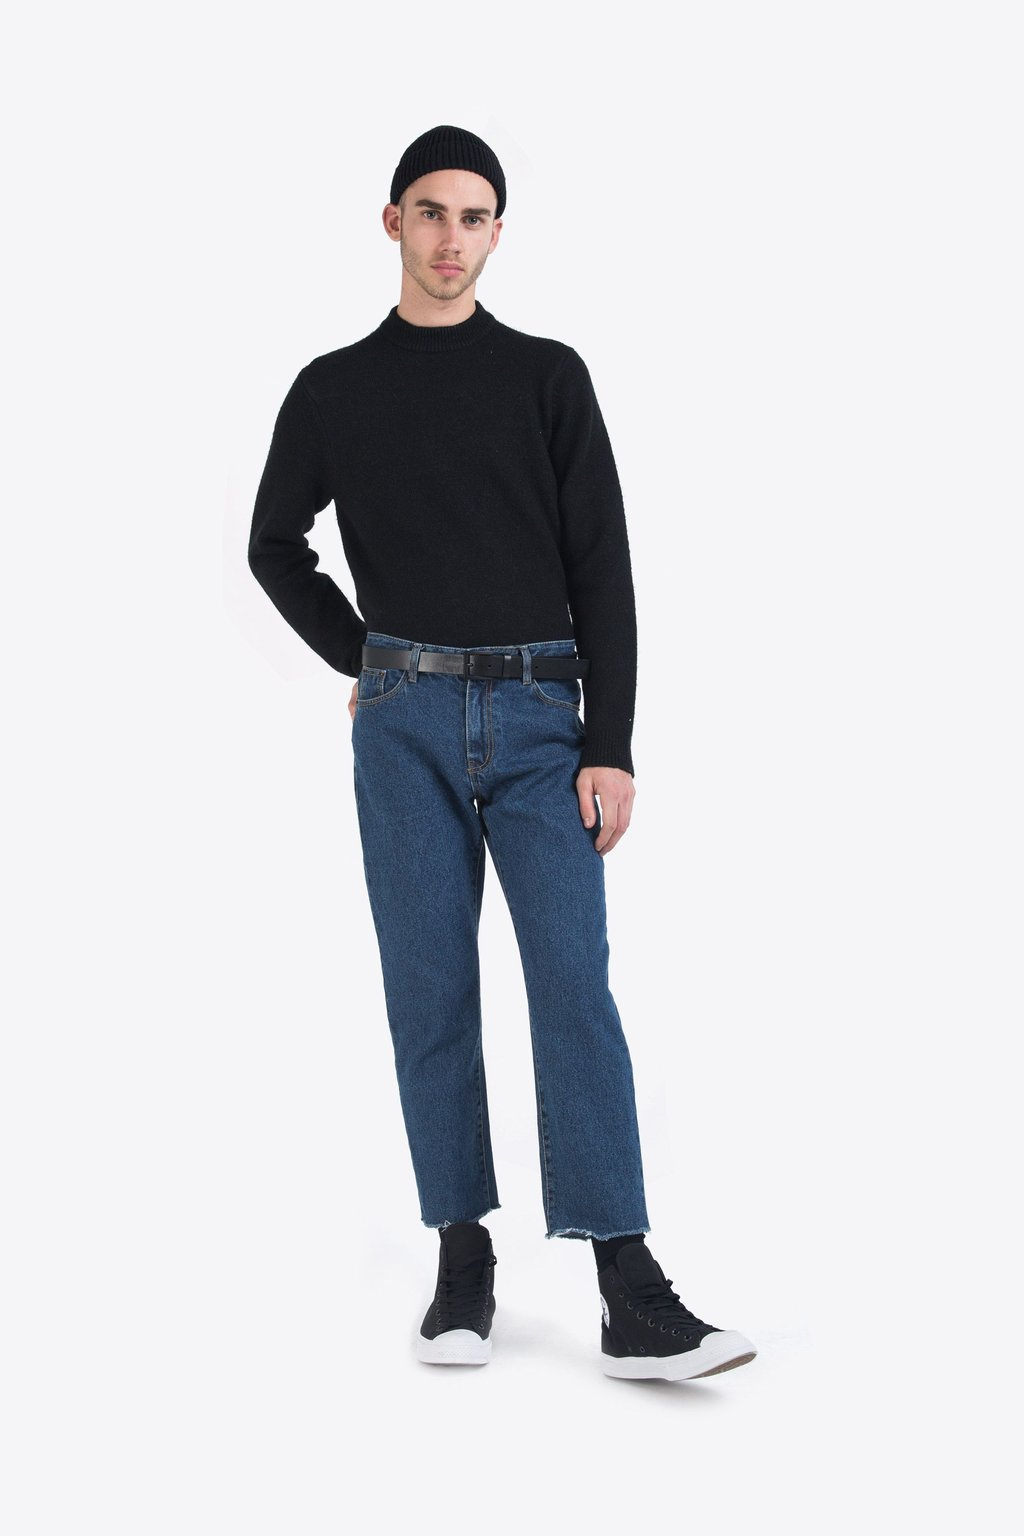 Sweater 7230 Black 6